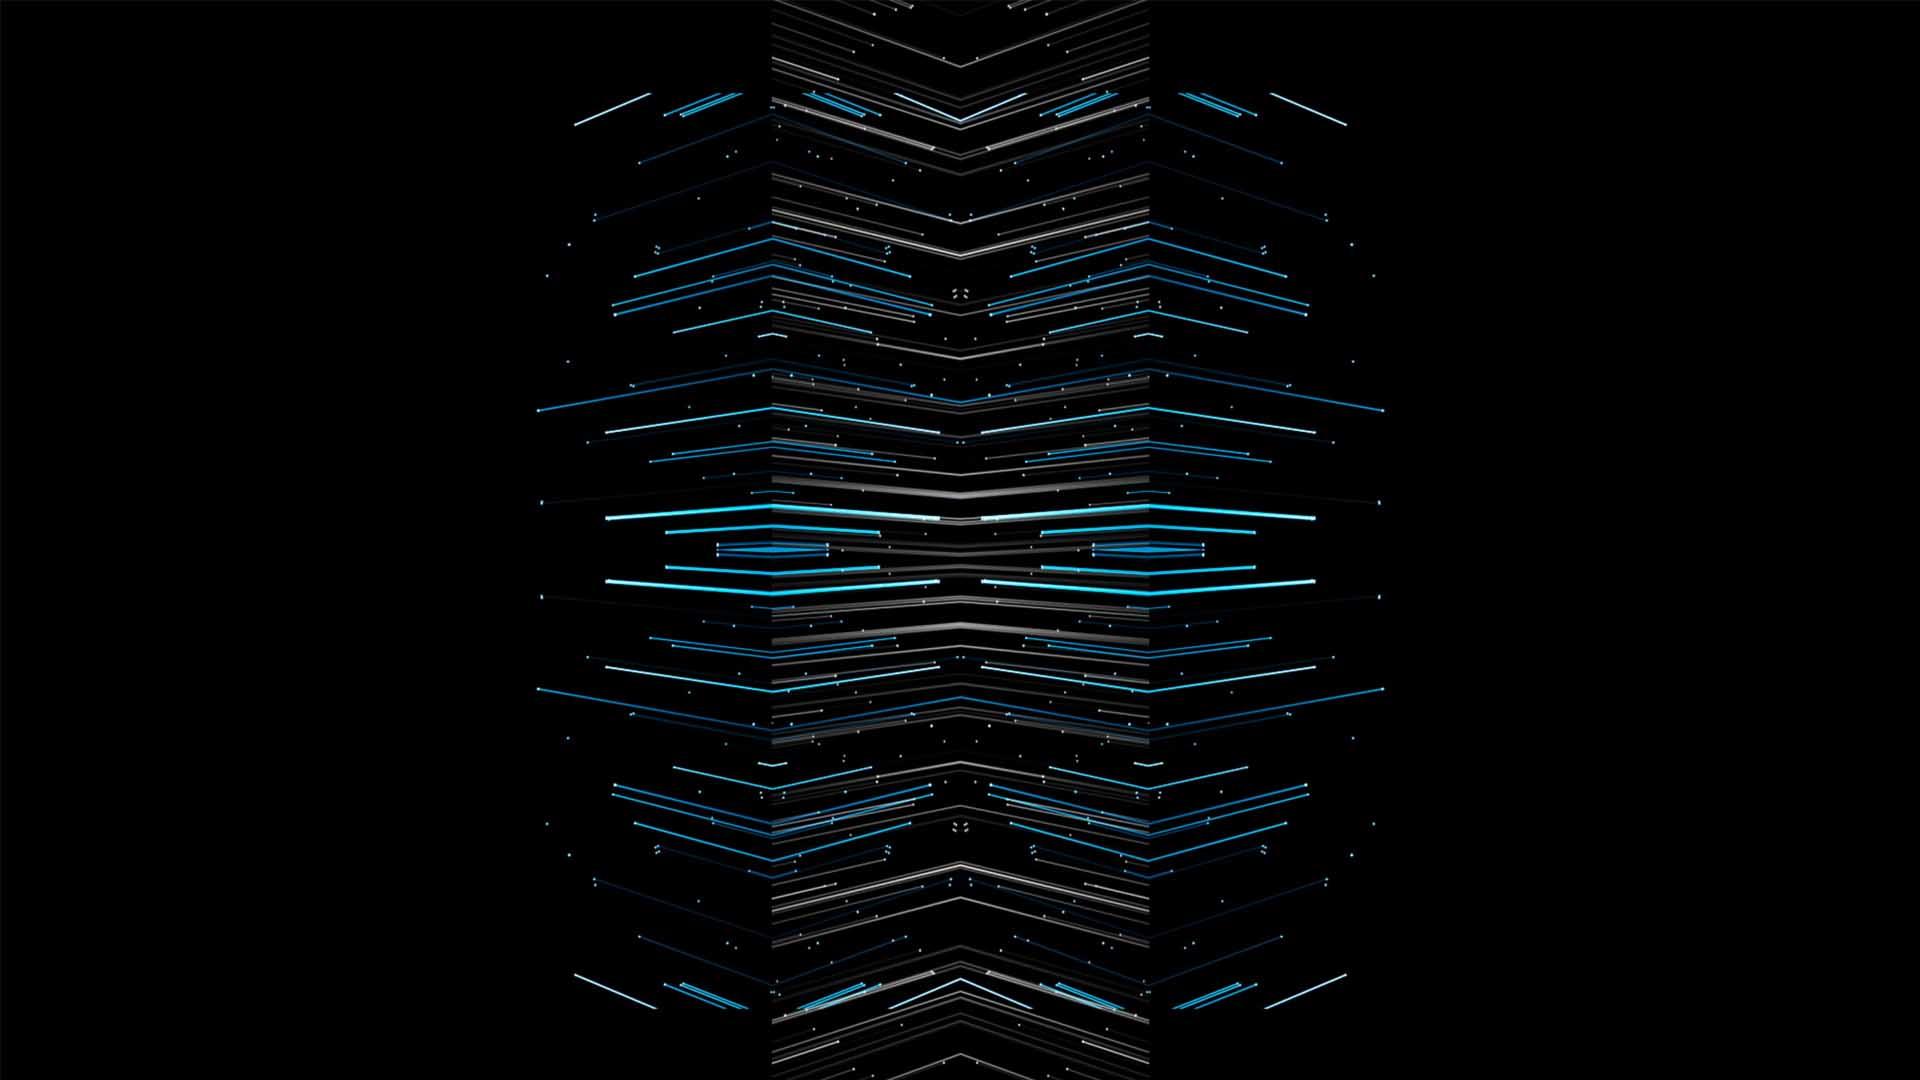 EDM_Visuals_DJ_background_Video_Footage_VJ_Loop_HD